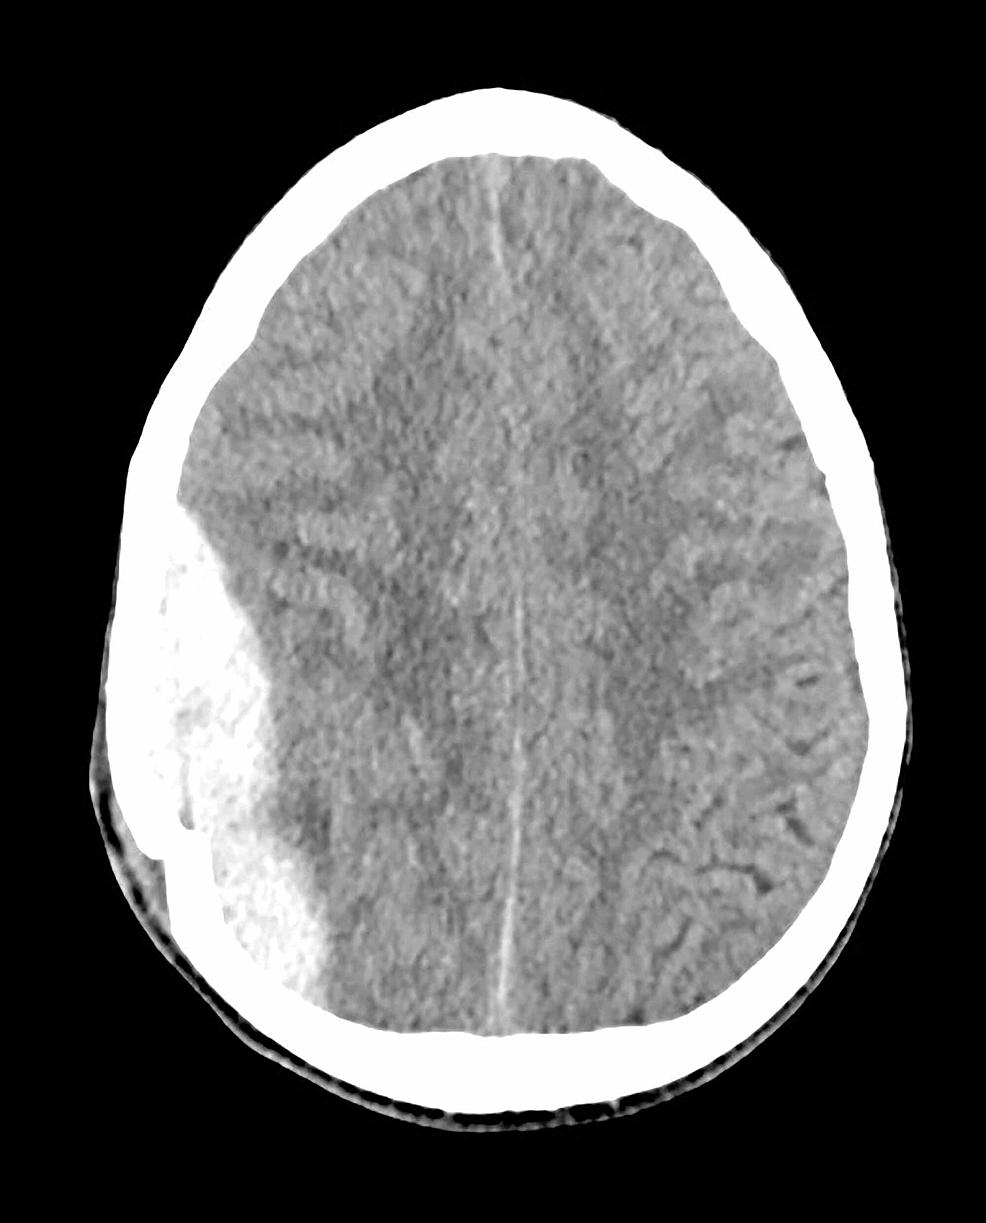 Epidural-hematoma-underlying-a-depressed-skull-fracture